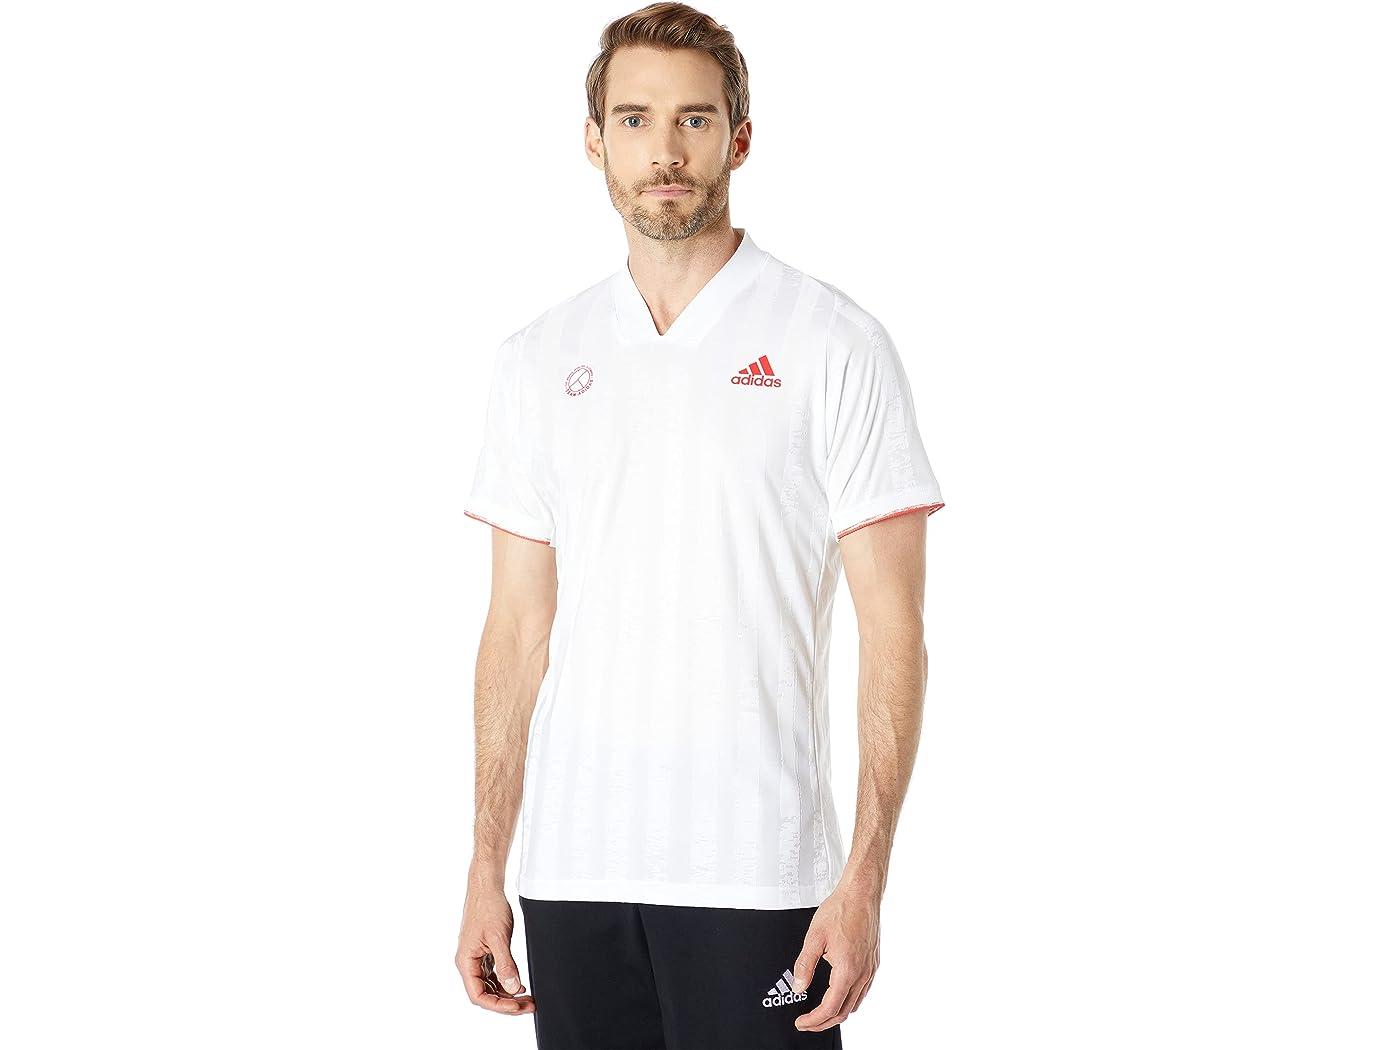 Adidas Tennis Freelift Tee